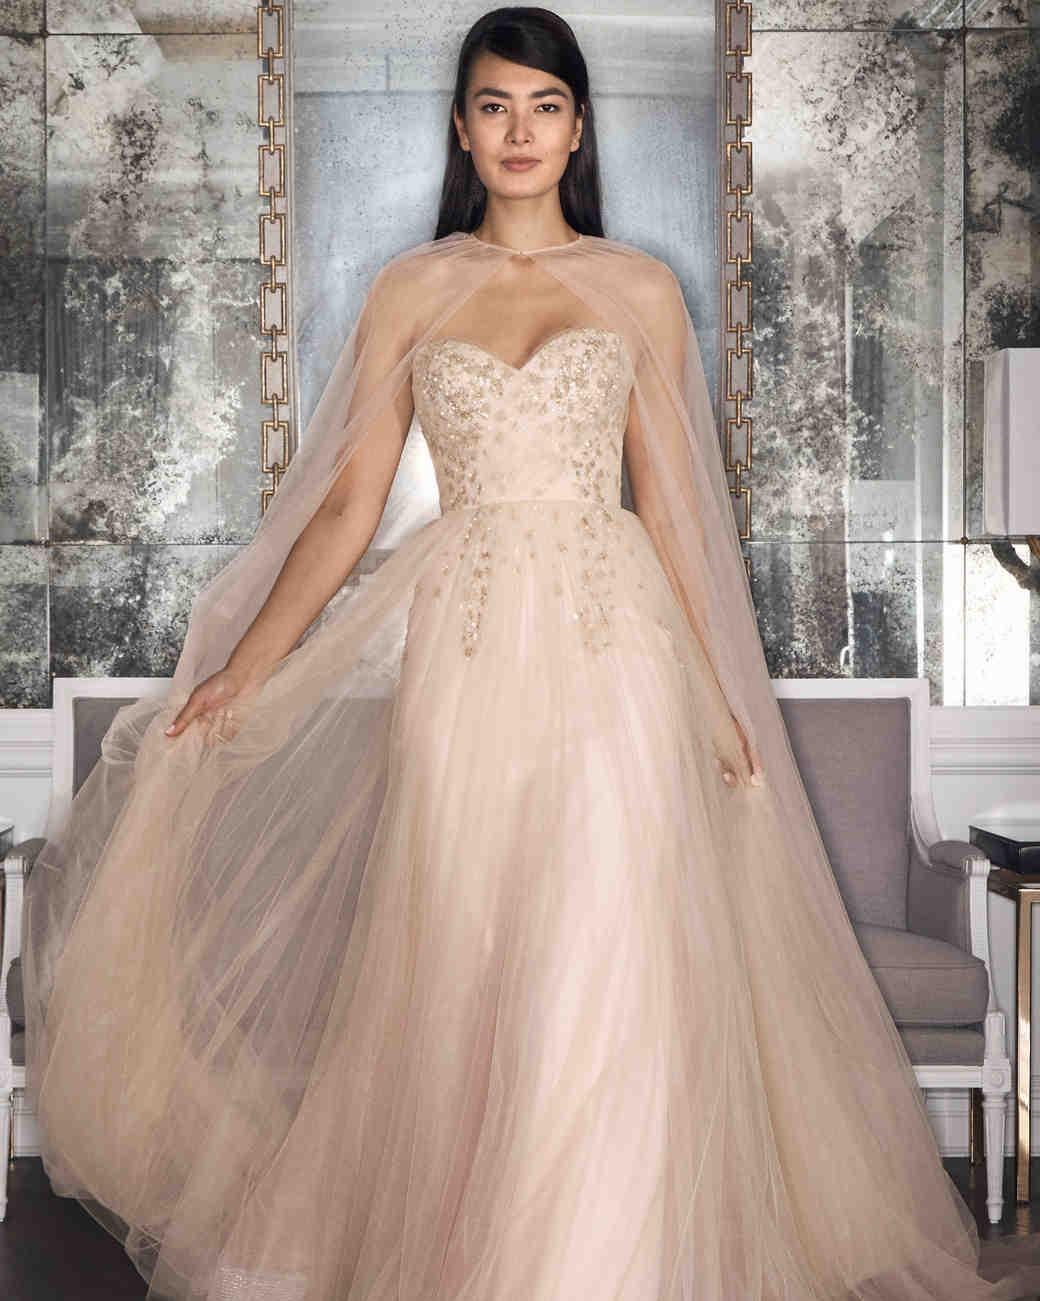 randi rahm wedding dresses fall party wedding dresses Romona Keveza Fall Wedding Dress Collection